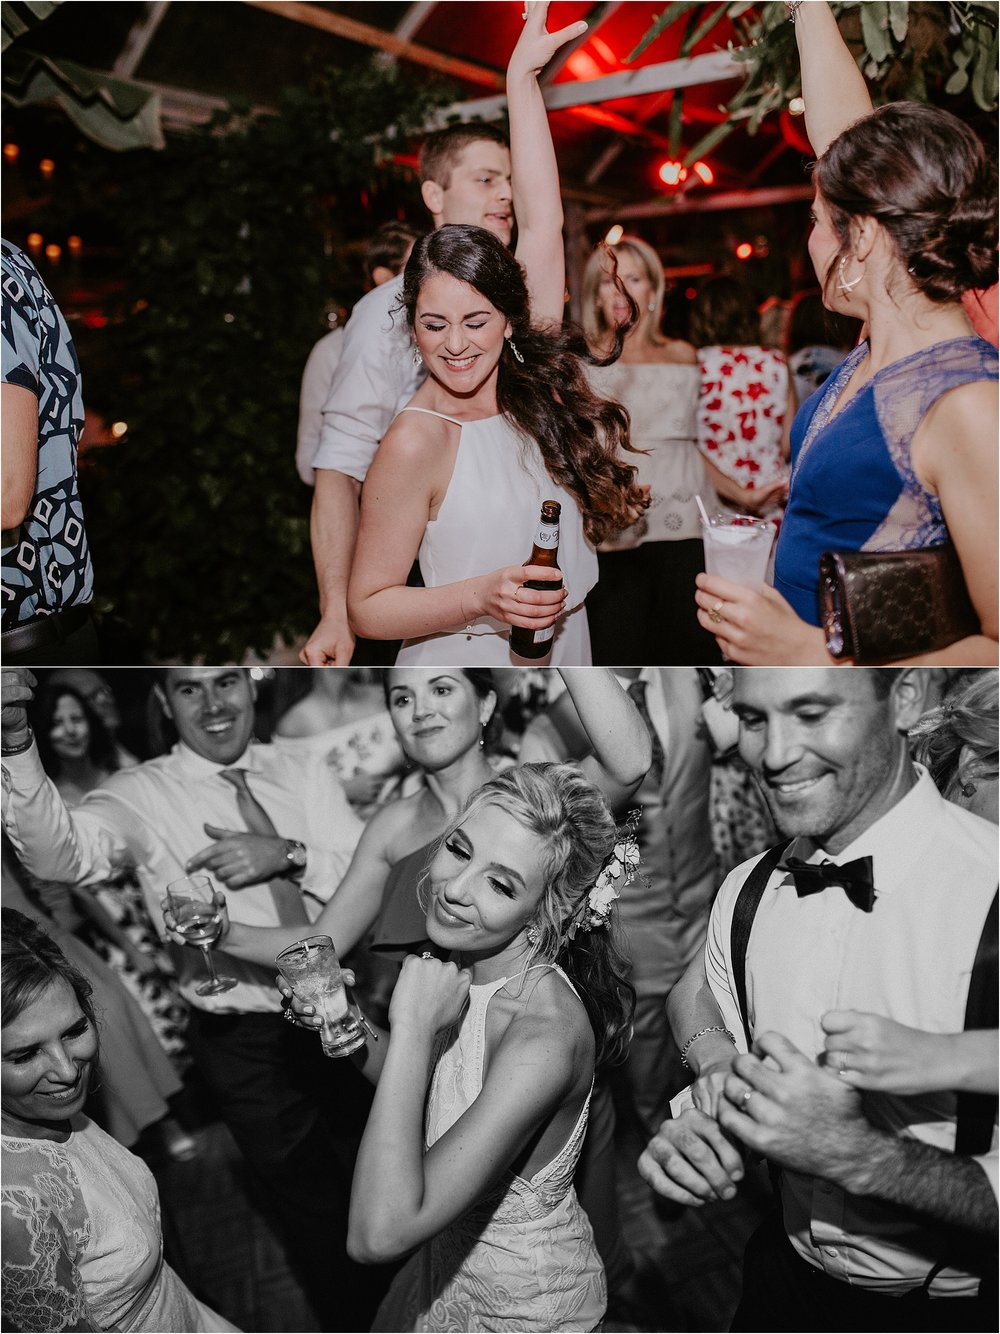 Sarah_Brookhart_Hortulus_Farm_Garden_and_Nursey_Wedding_Photographer_0080.jpg